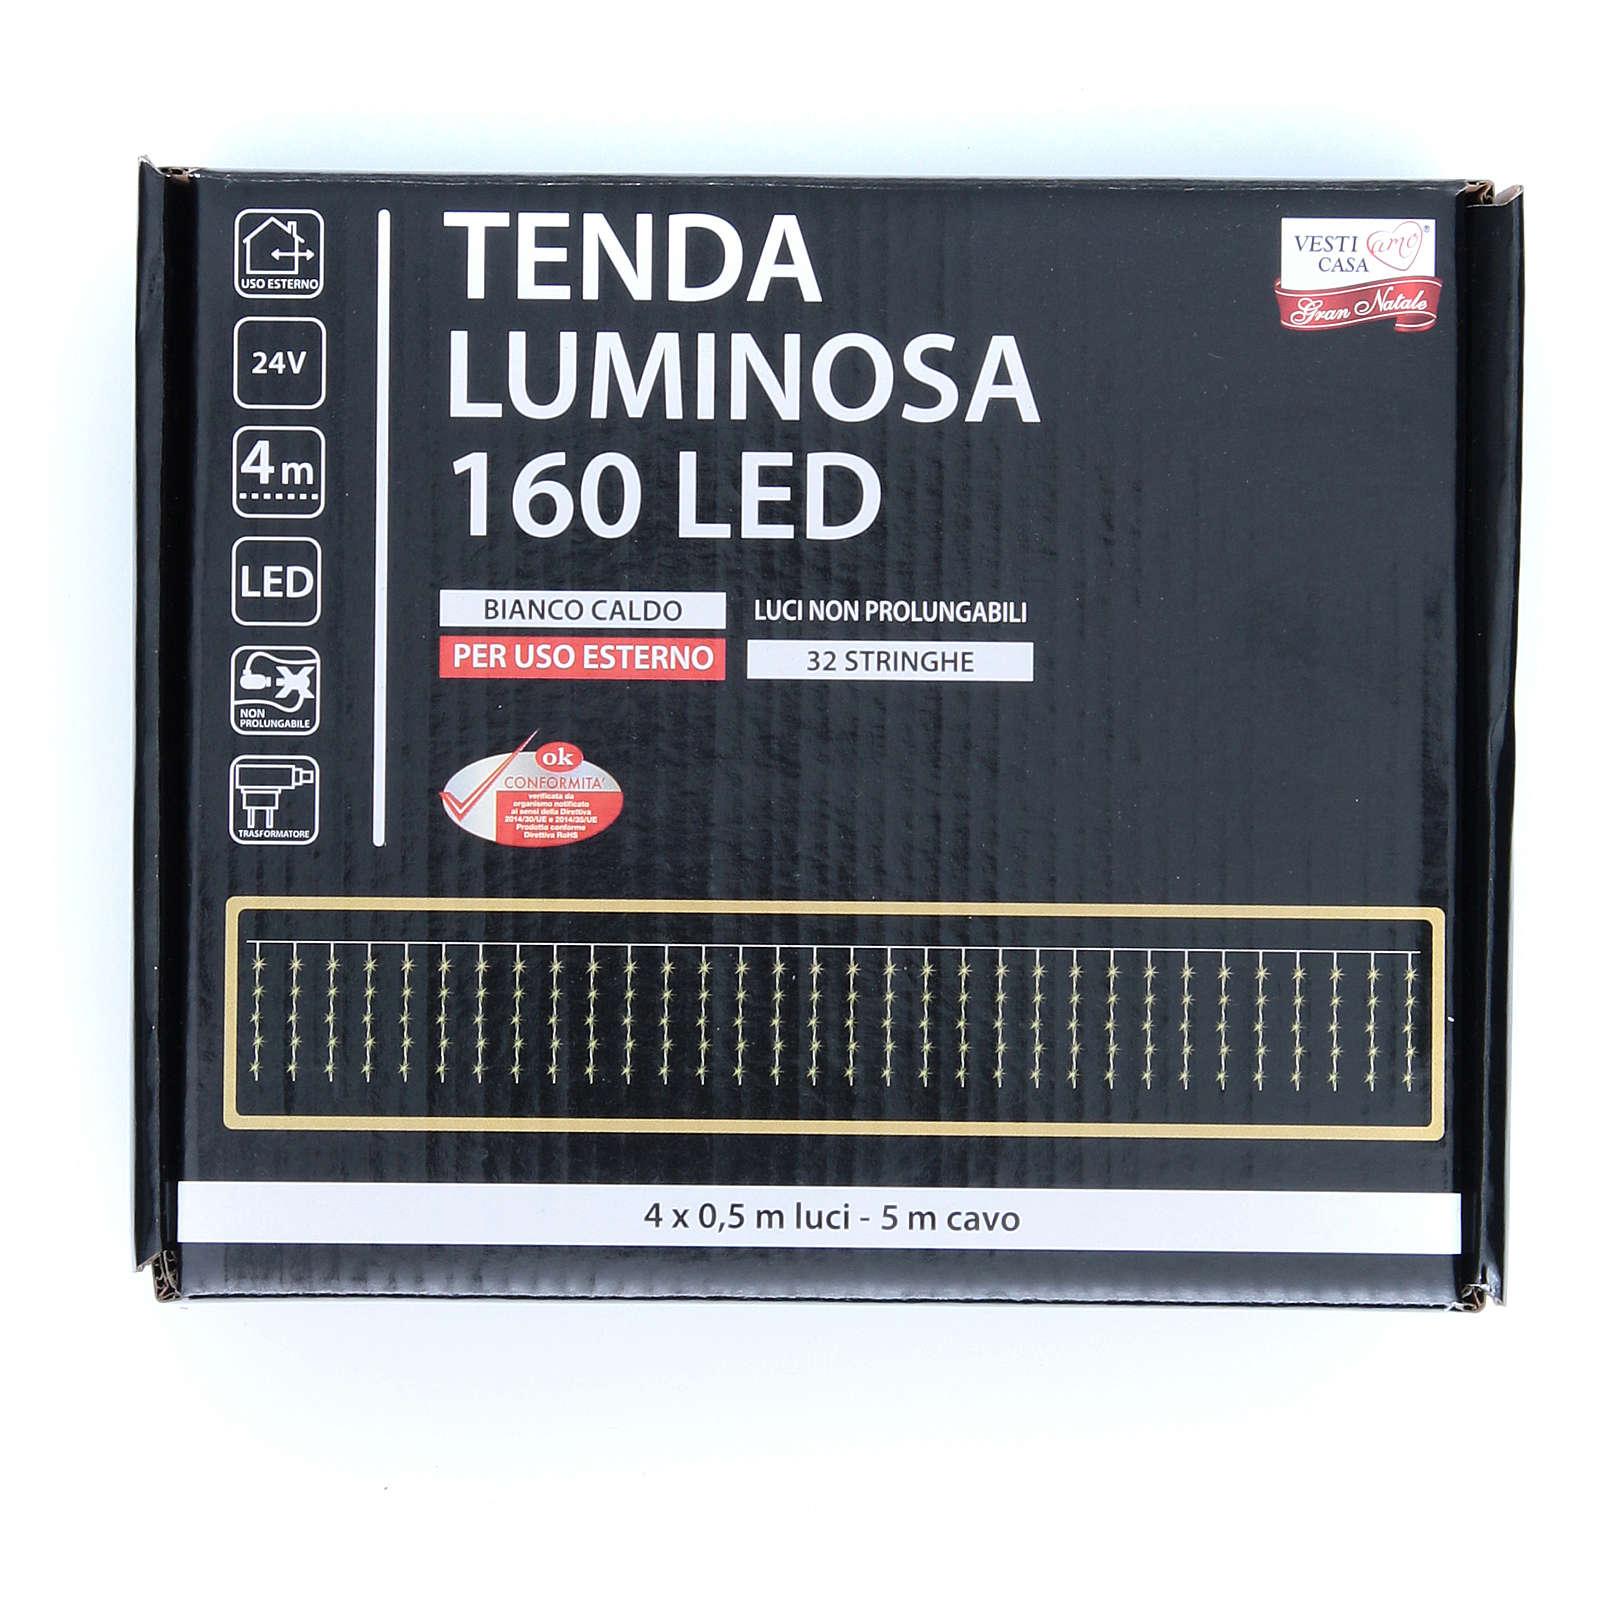 Cortina de luces de Navidad 160 LED blanco cálido para exterior 3